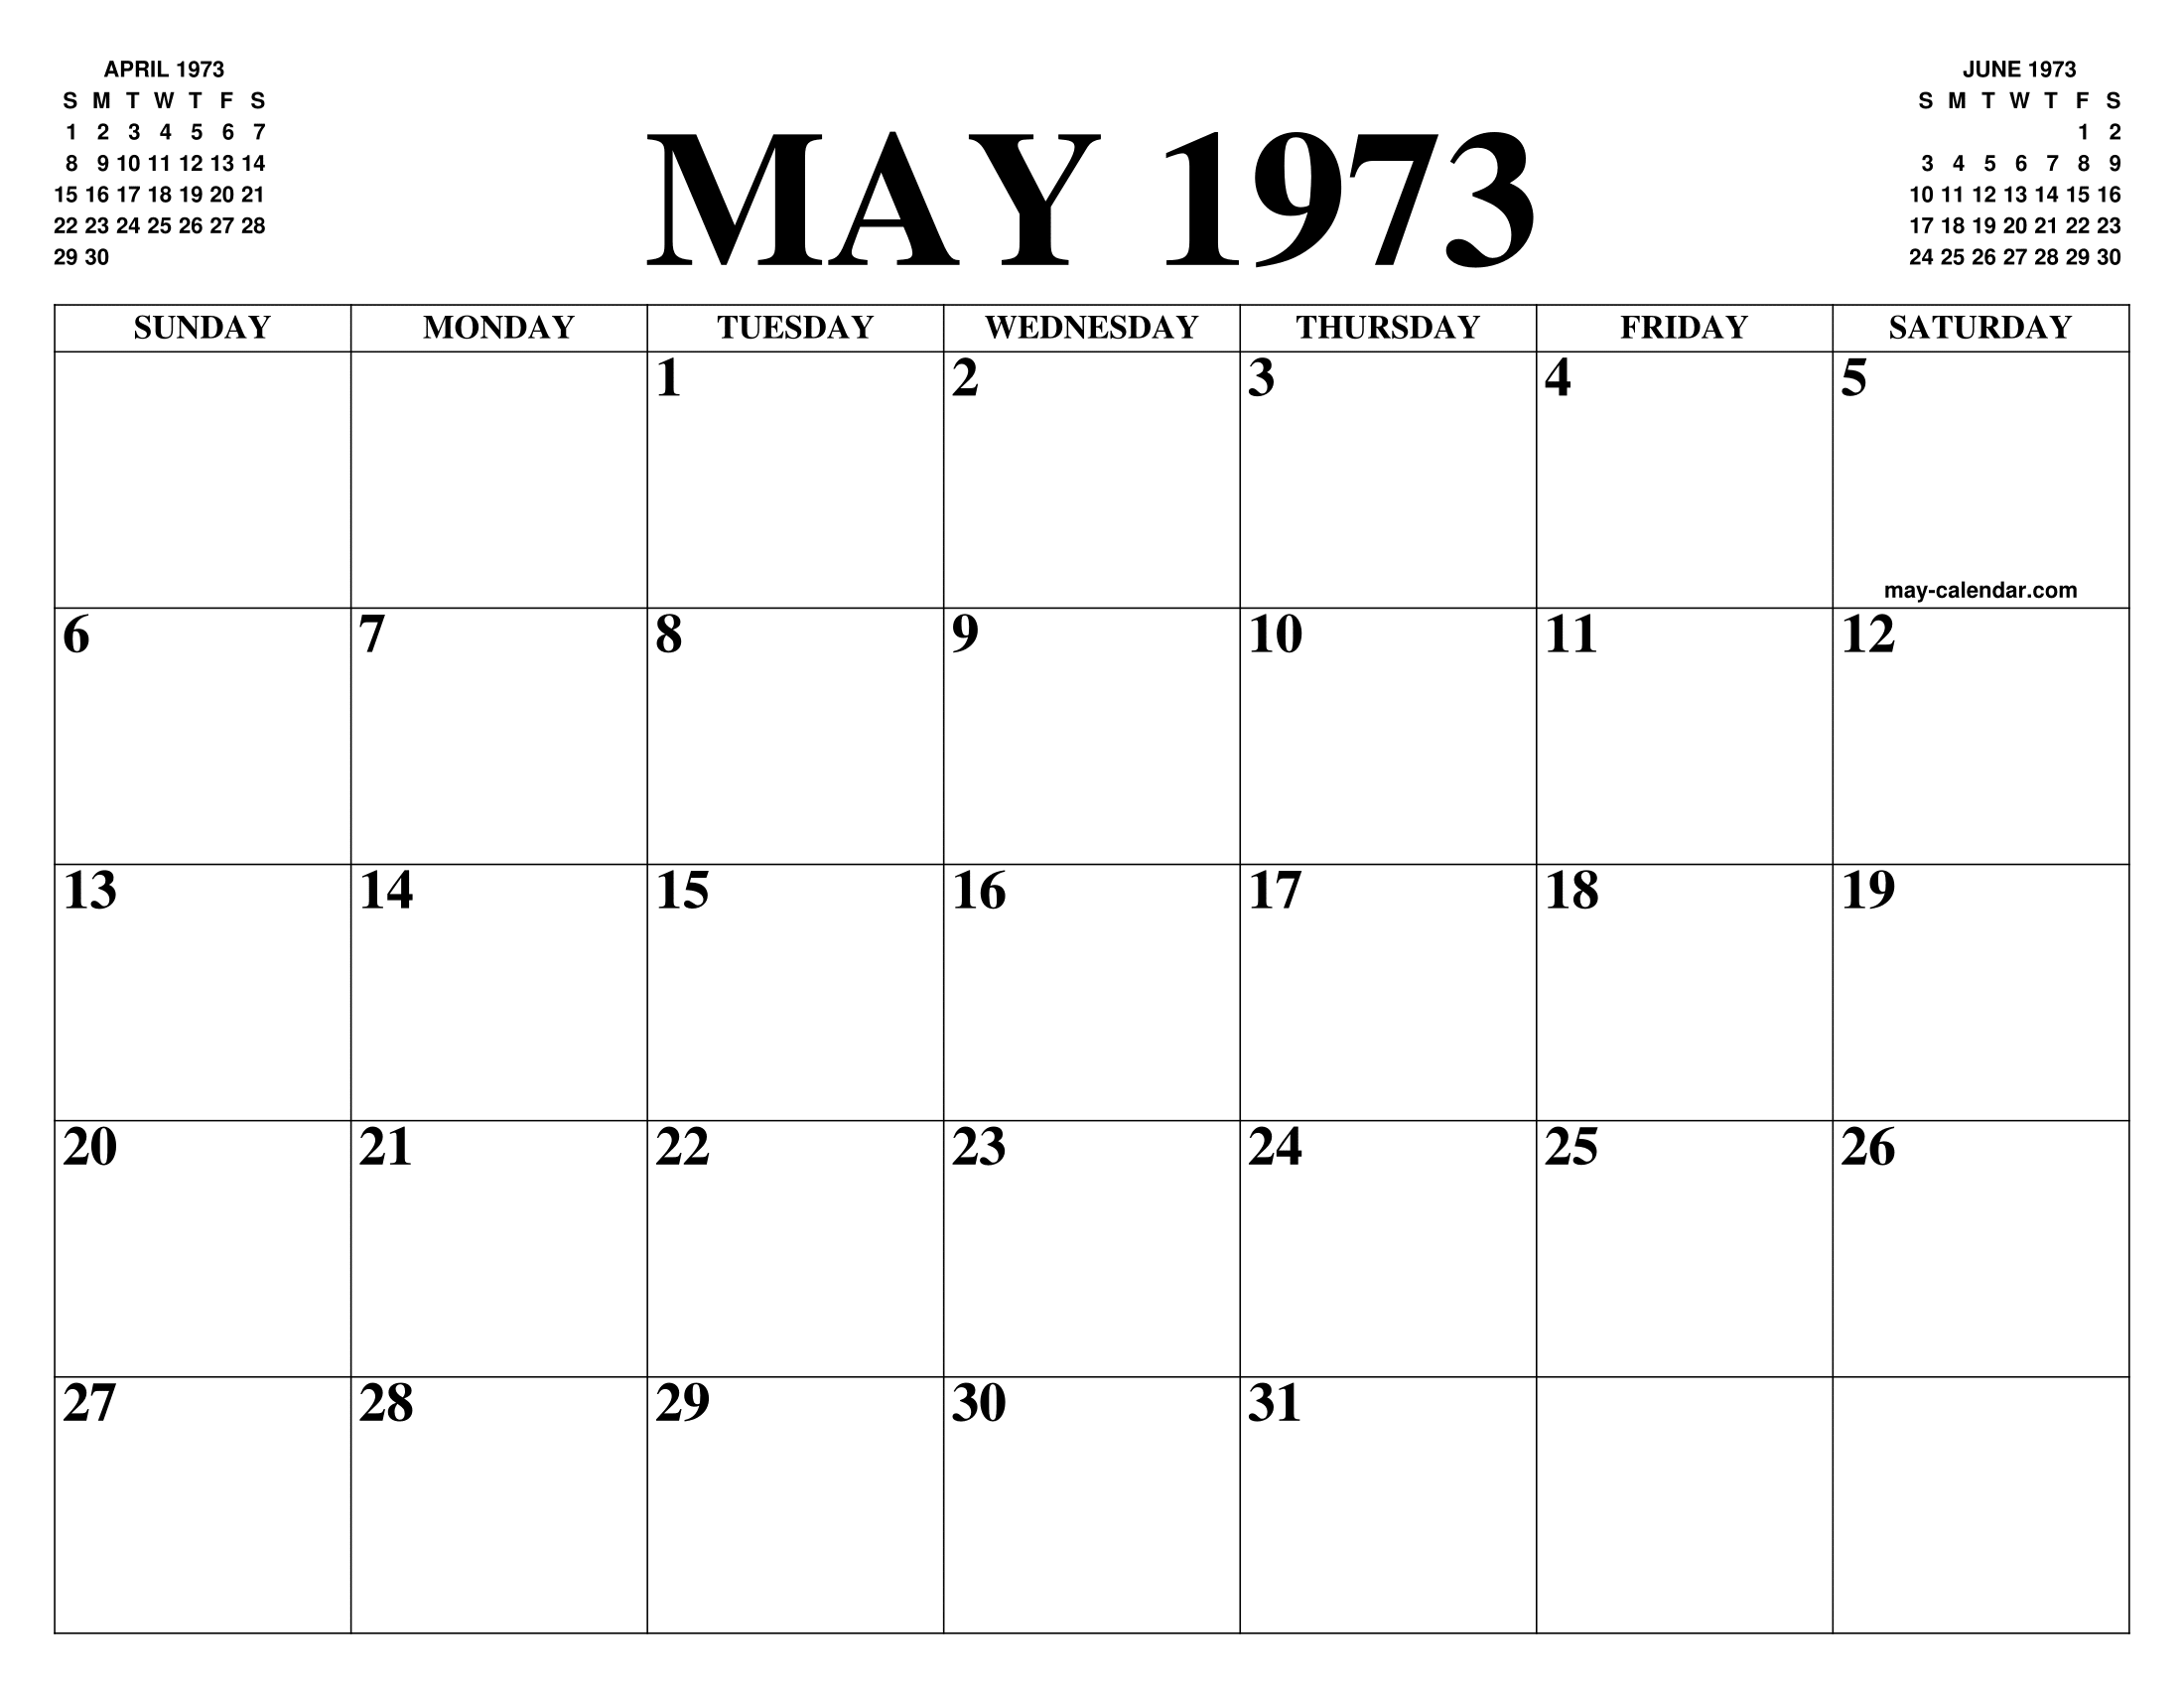 Calendario 1973.May 1973 Calendar Of The Month Free Printable May Calendar